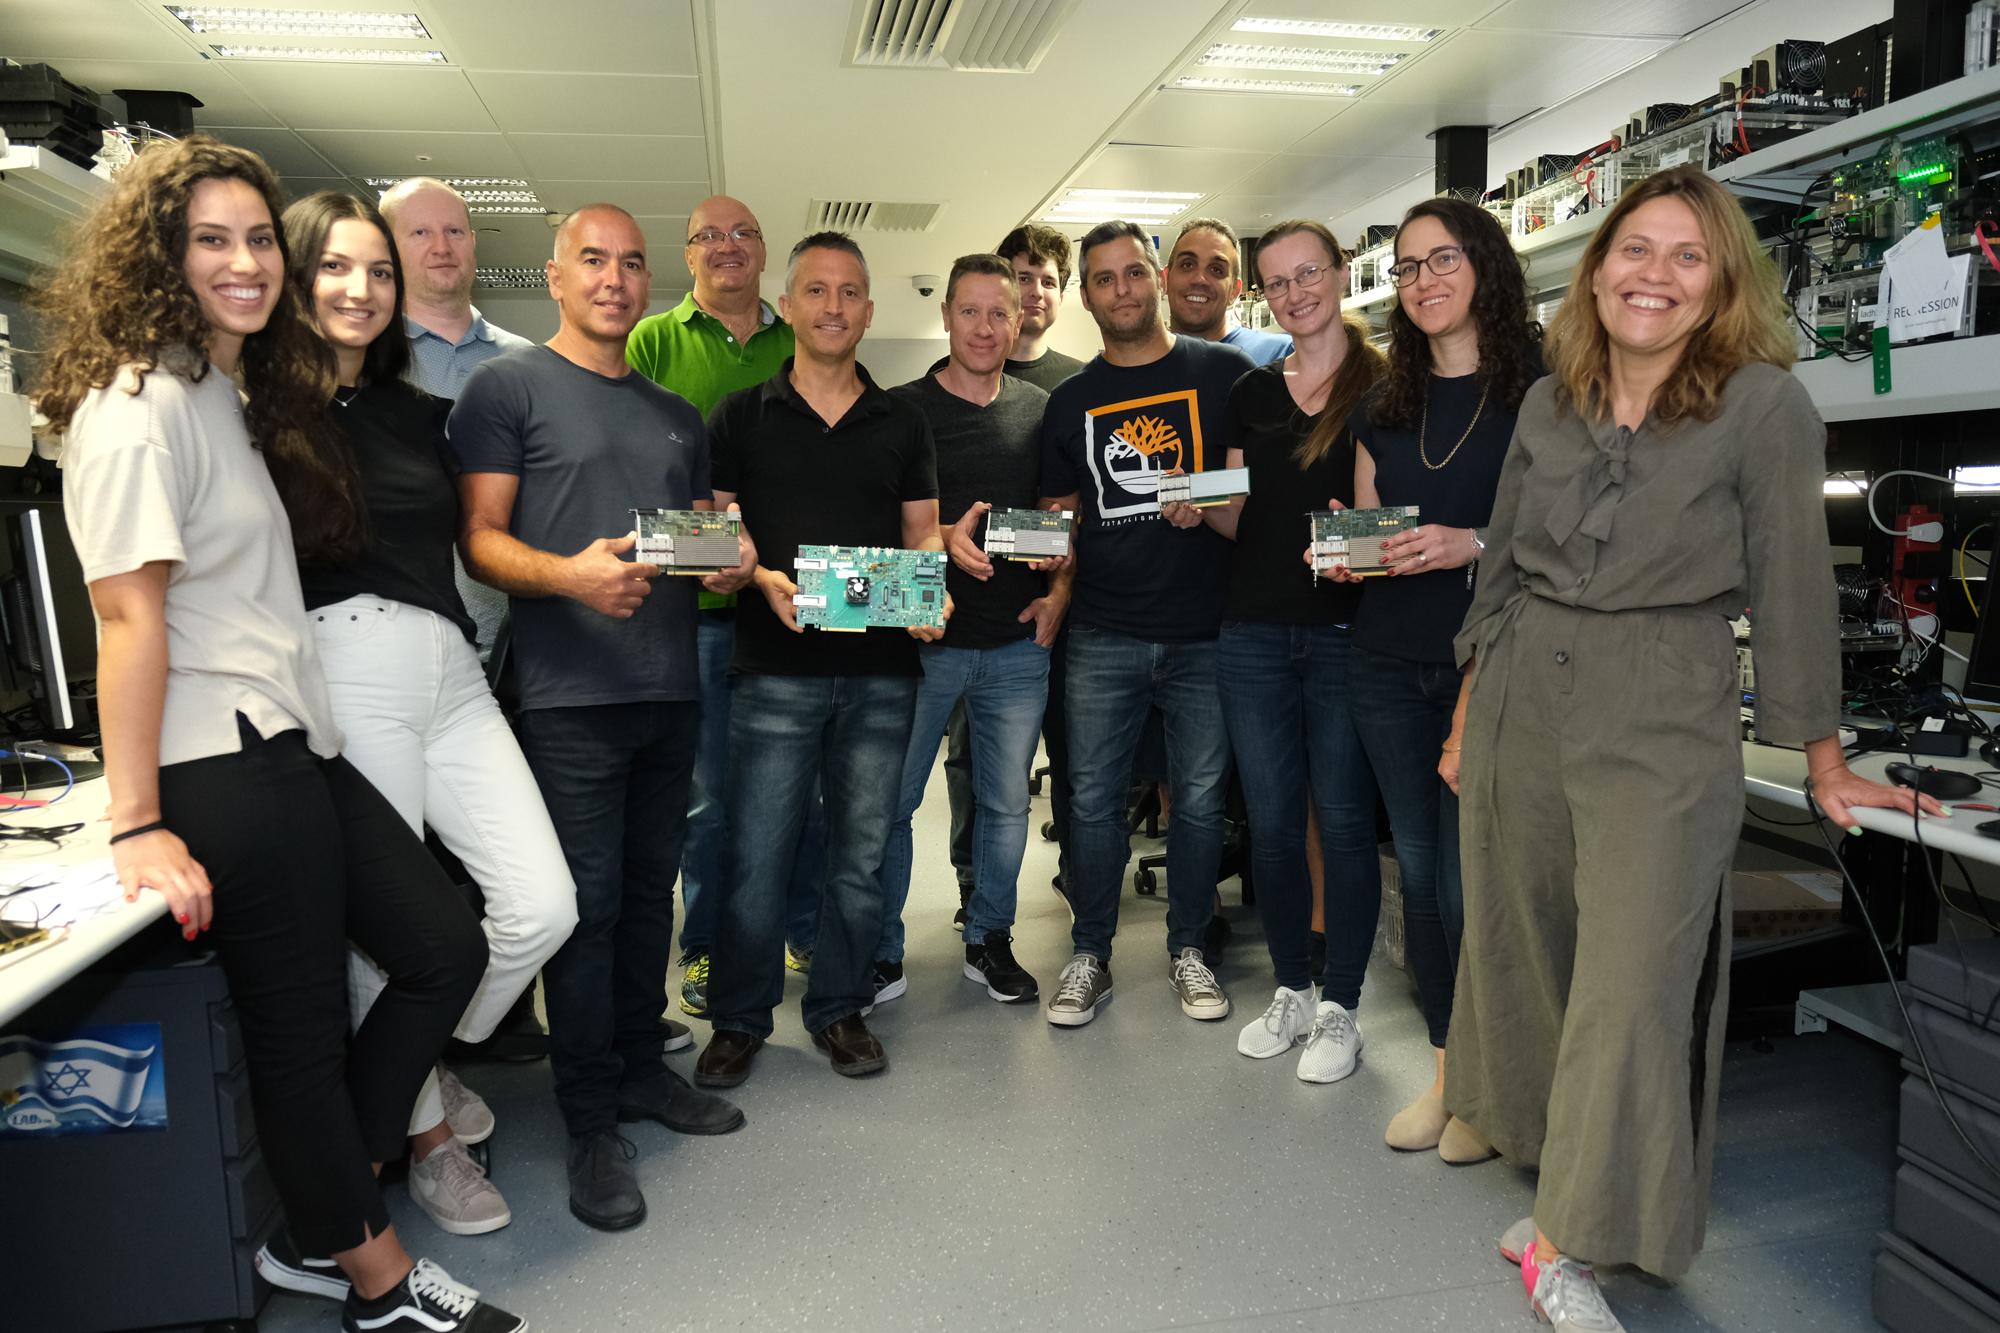 Intel employees Photo: Asaf Patoka